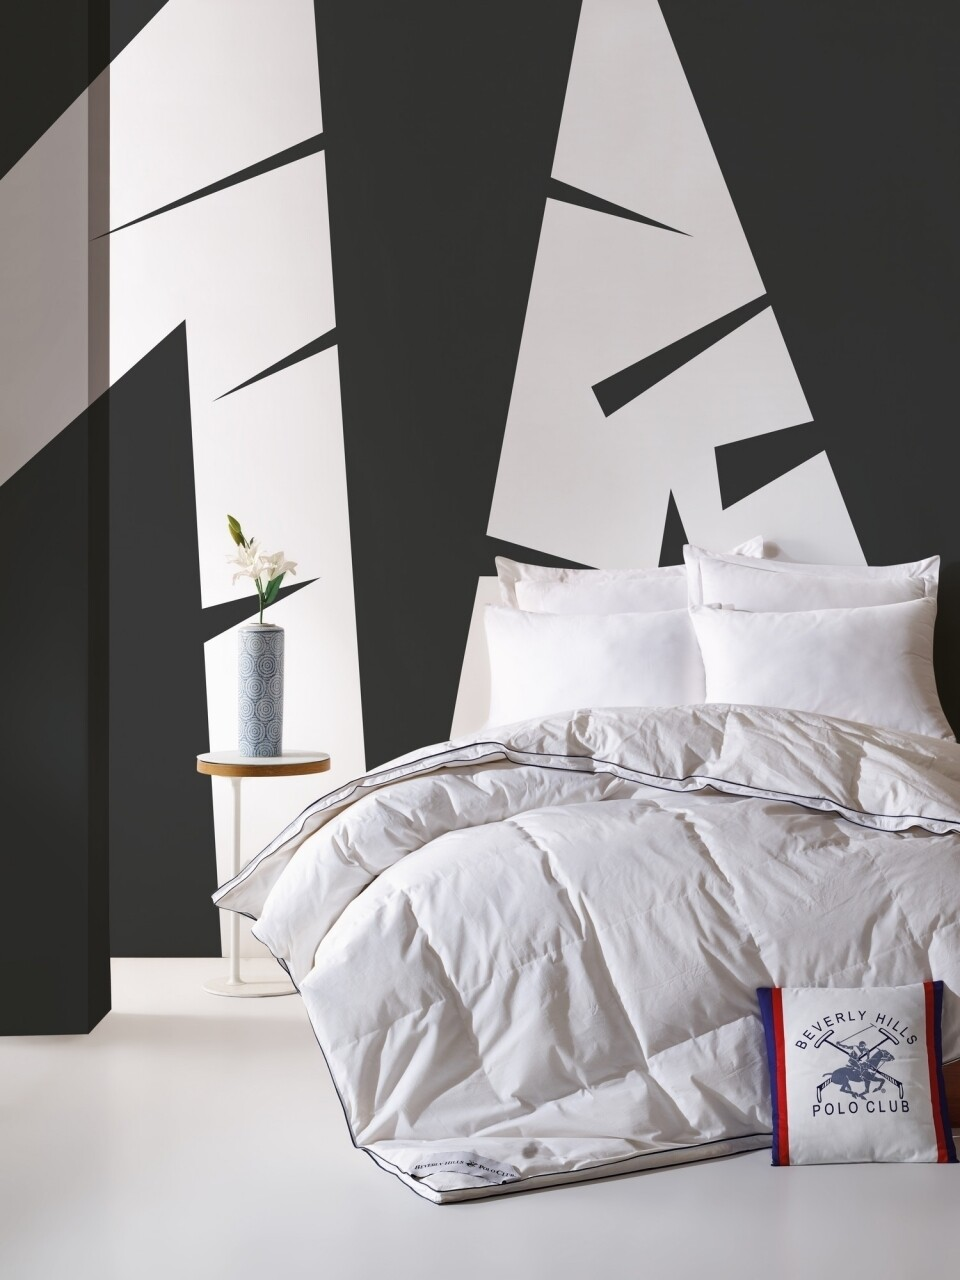 Cuvertura de pat, matlasata, 195x215 cm, 100% bumbac, Beverly Hills Polo Club, Serenity White